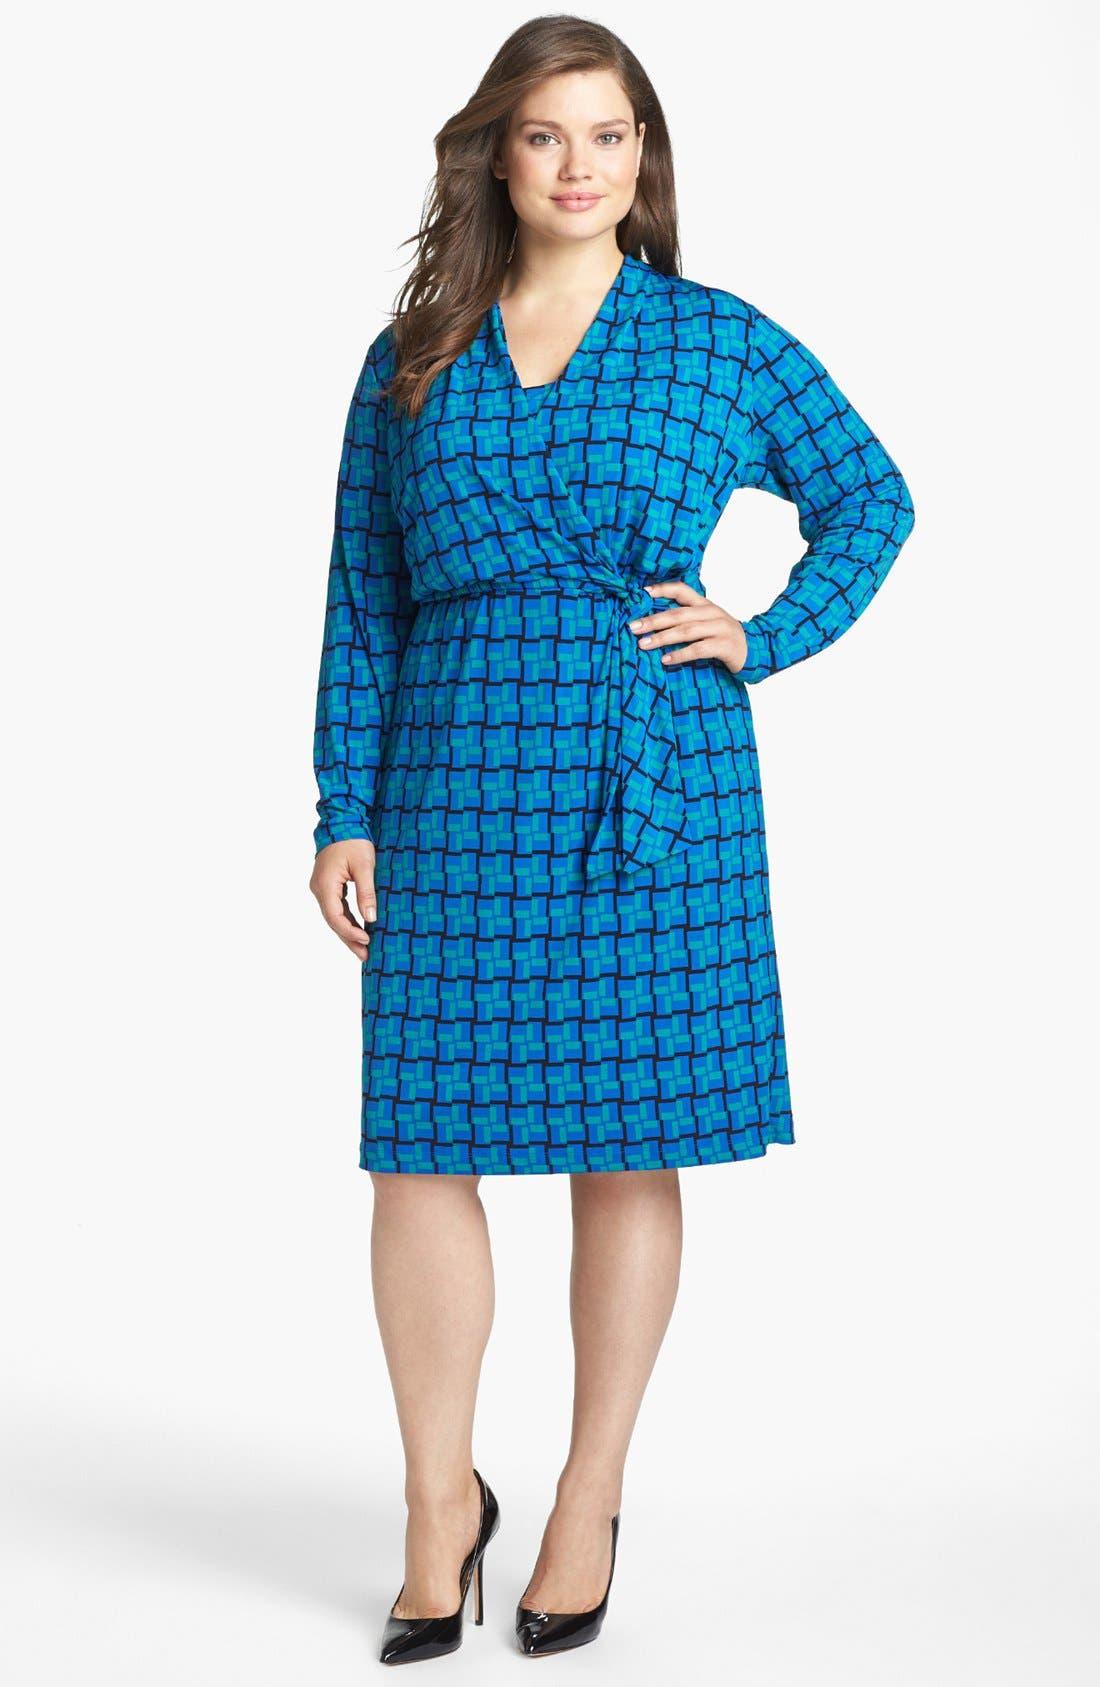 Alternate Image 1 Selected - Calvin Klein Print Faux Wrap Dress (Plus Size)